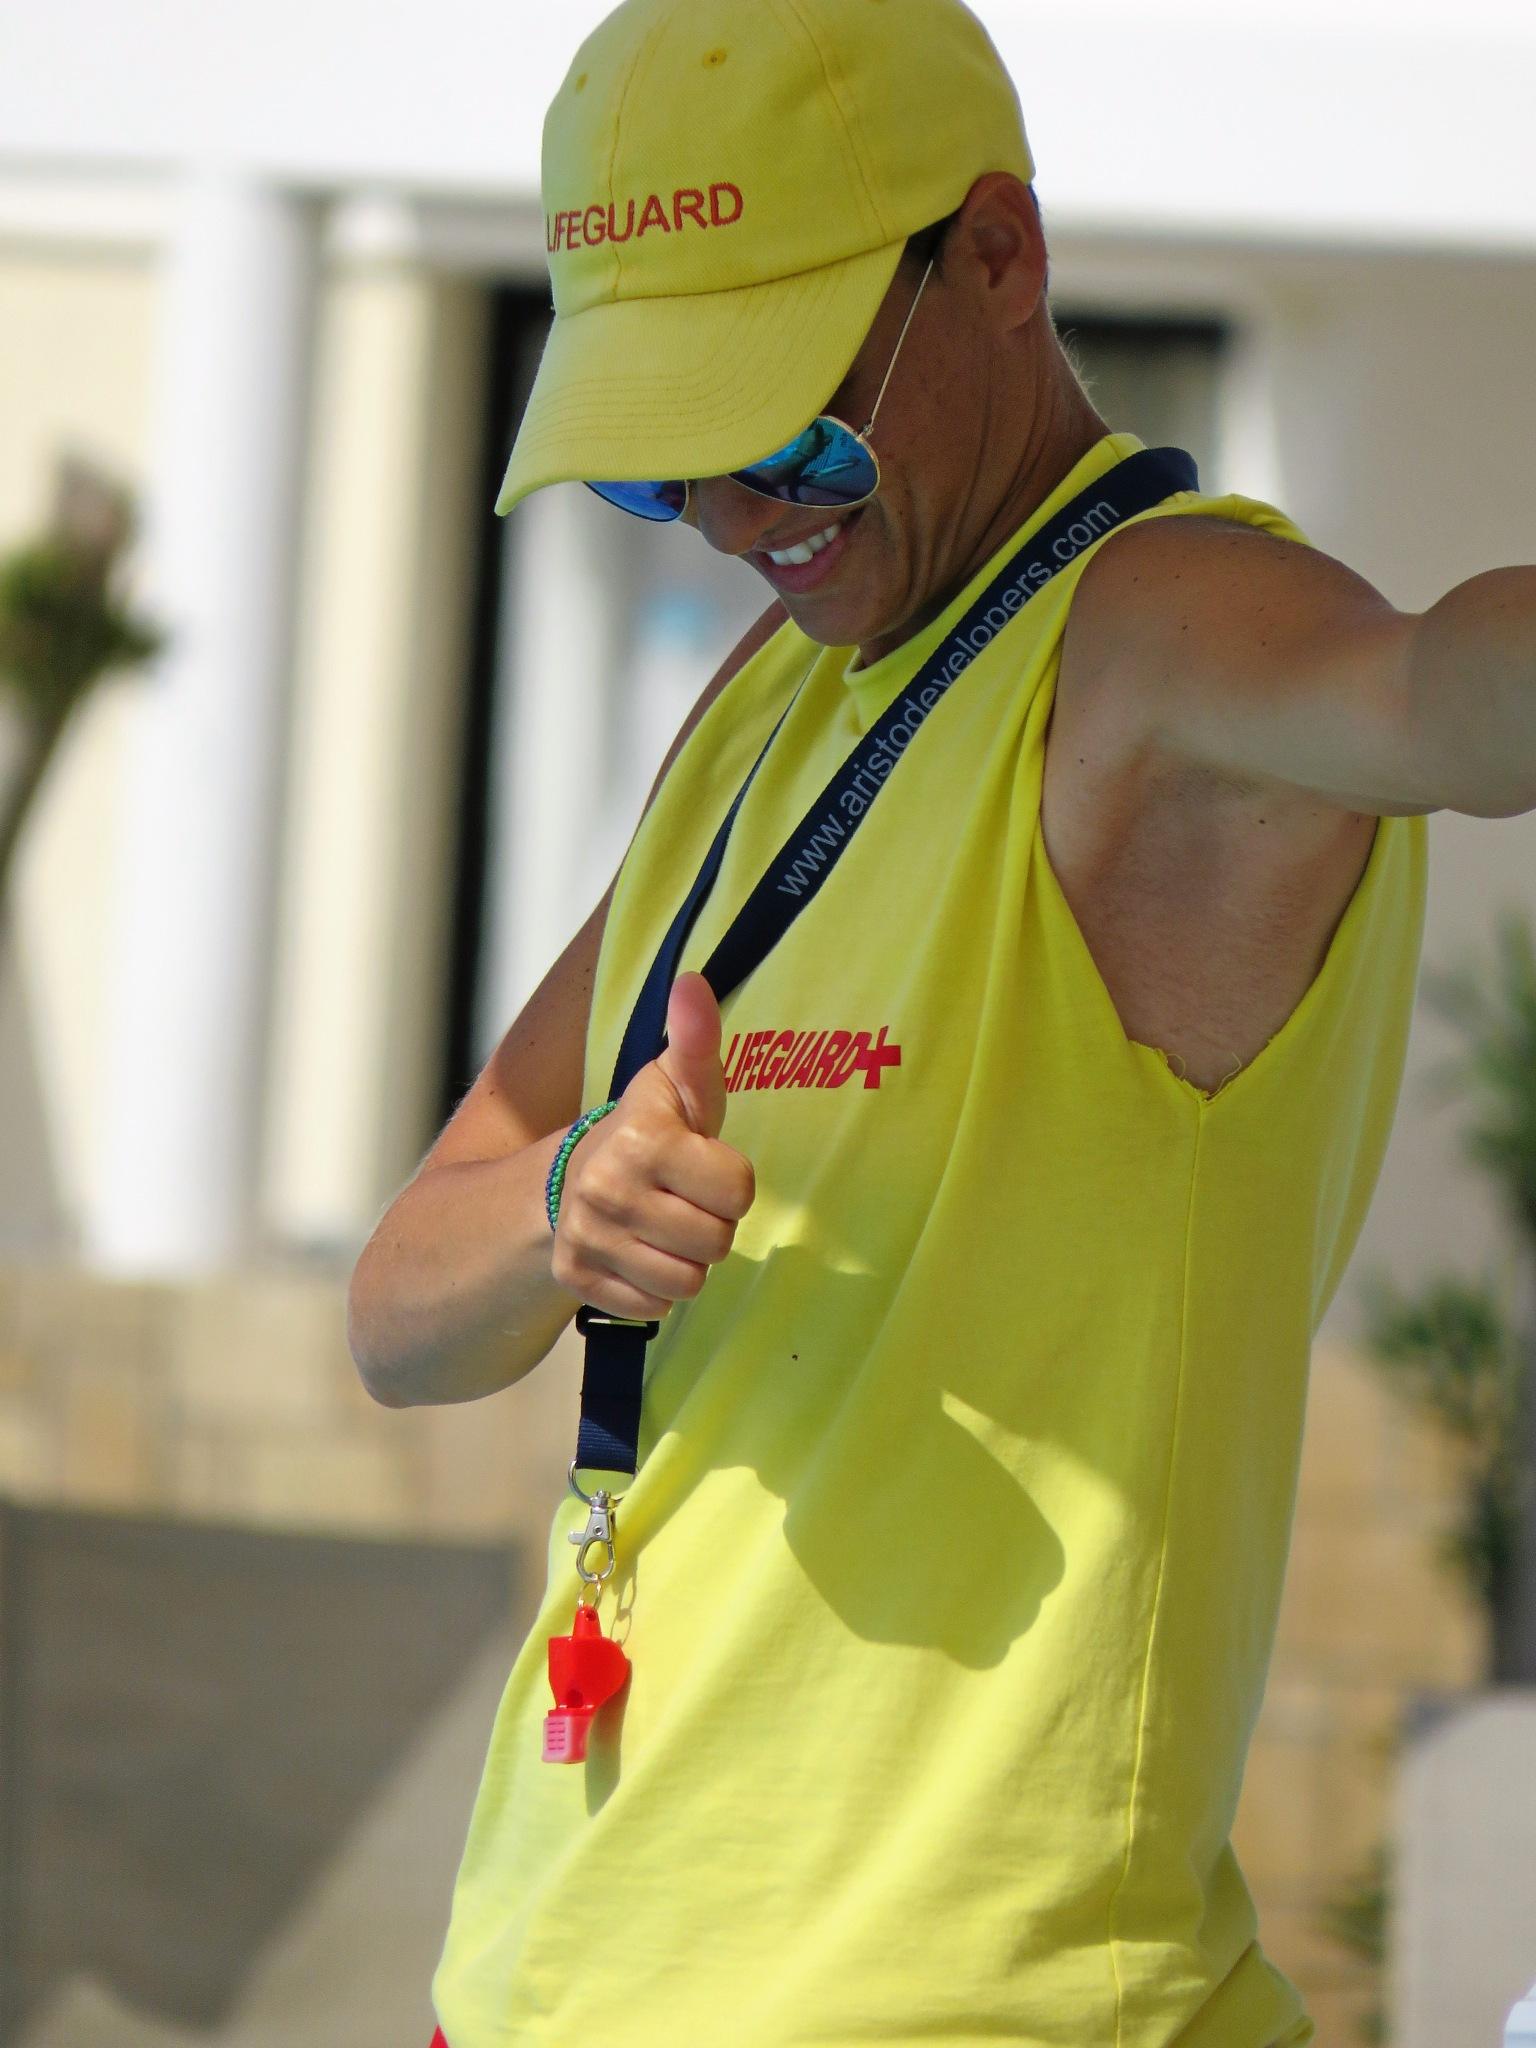 lifeguard by jeff butcher